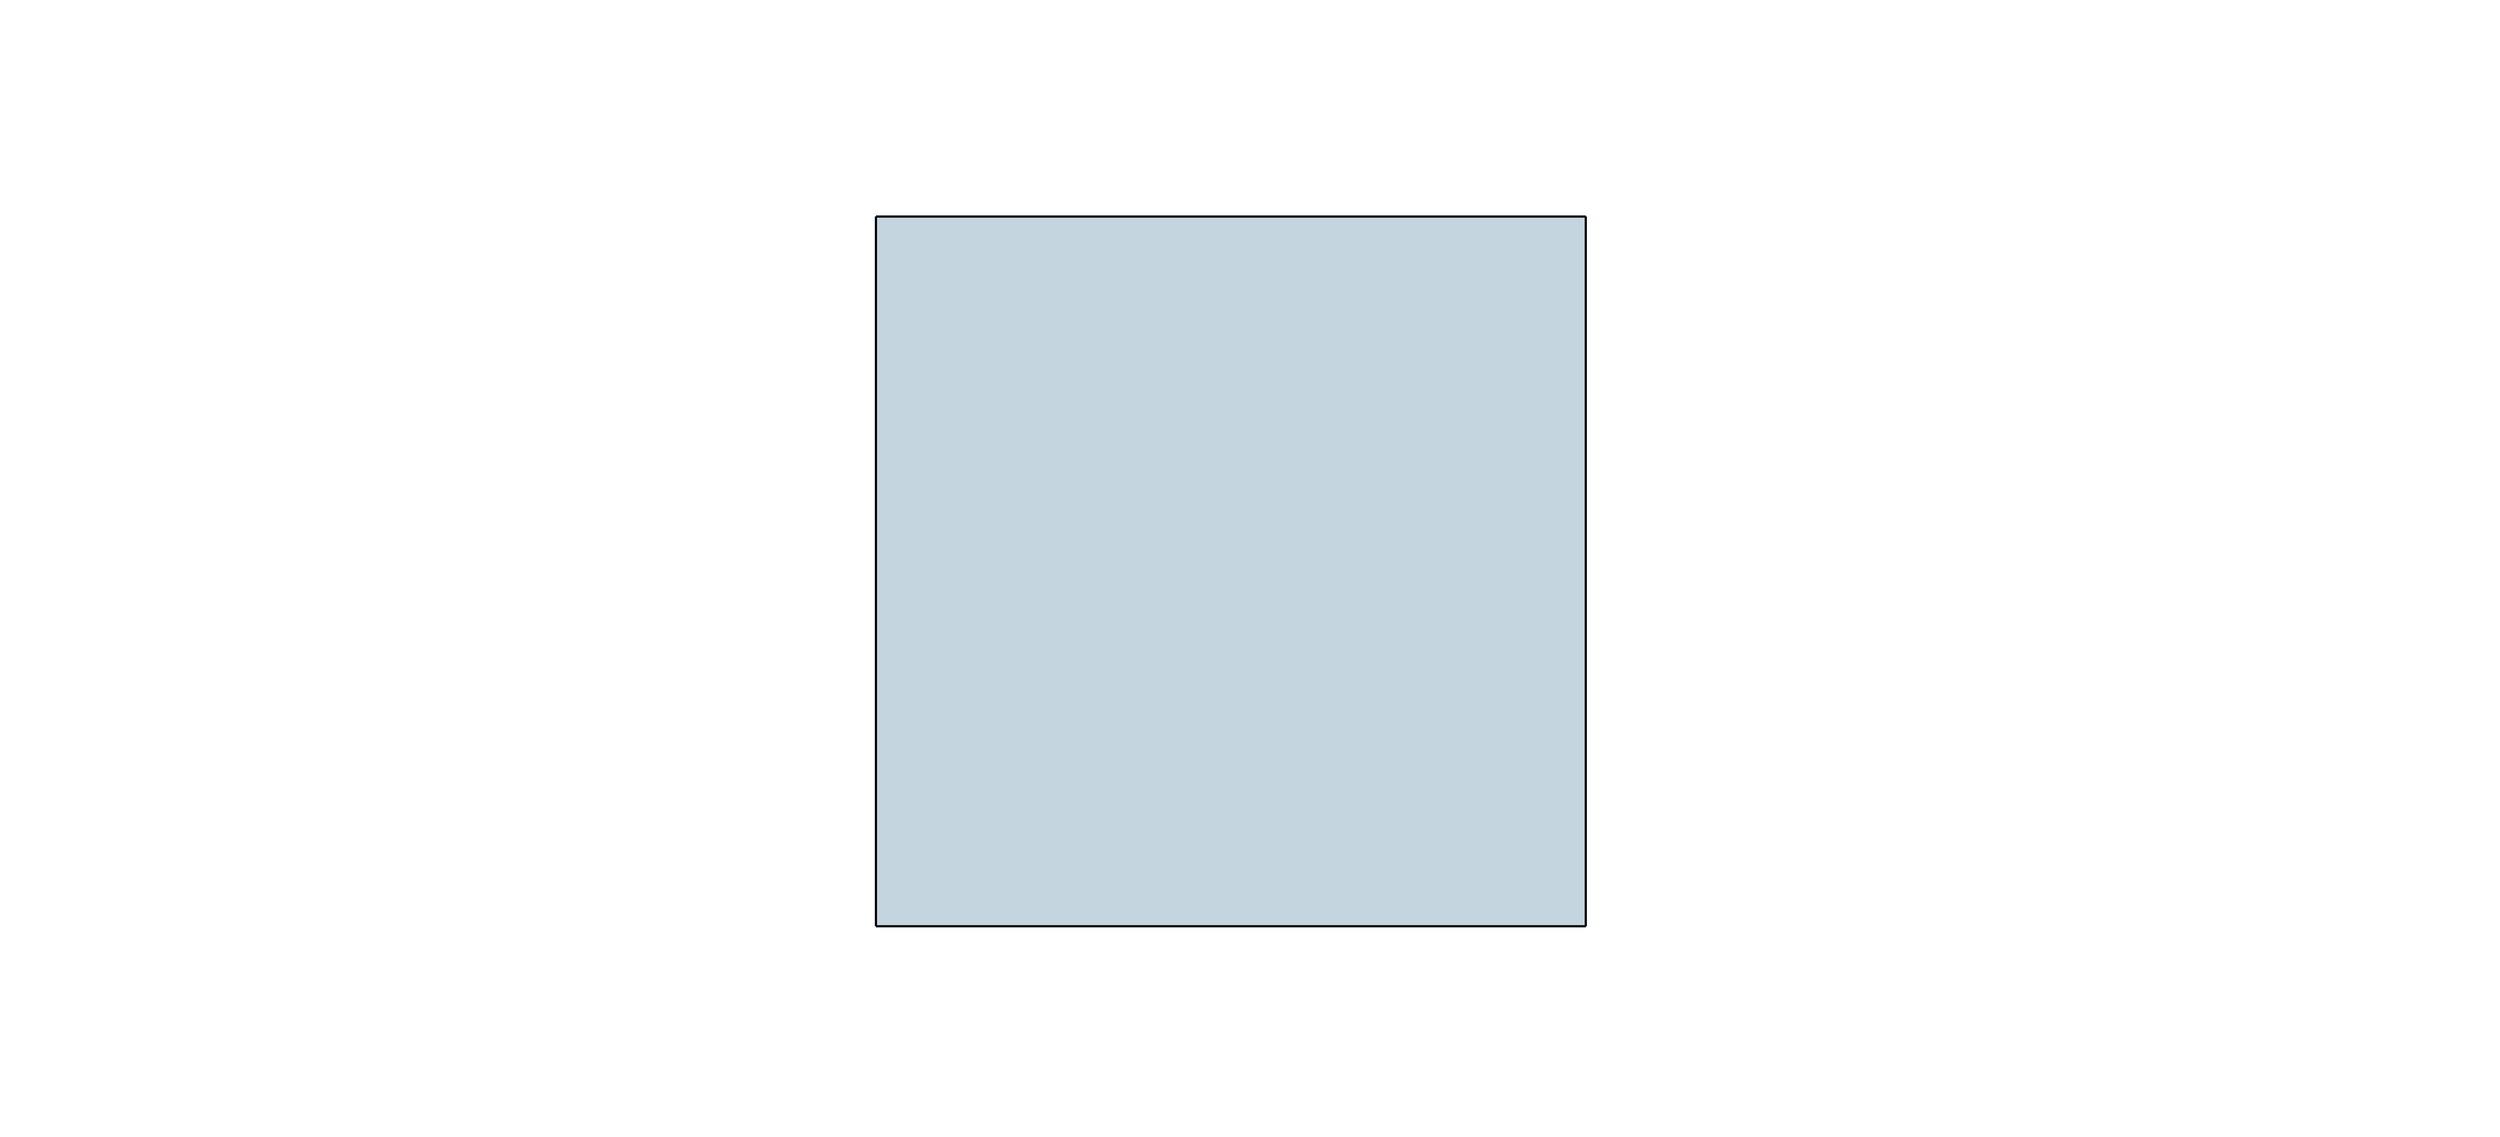 sketchupmodel_Assignment5_bottomview-page-0.jpg